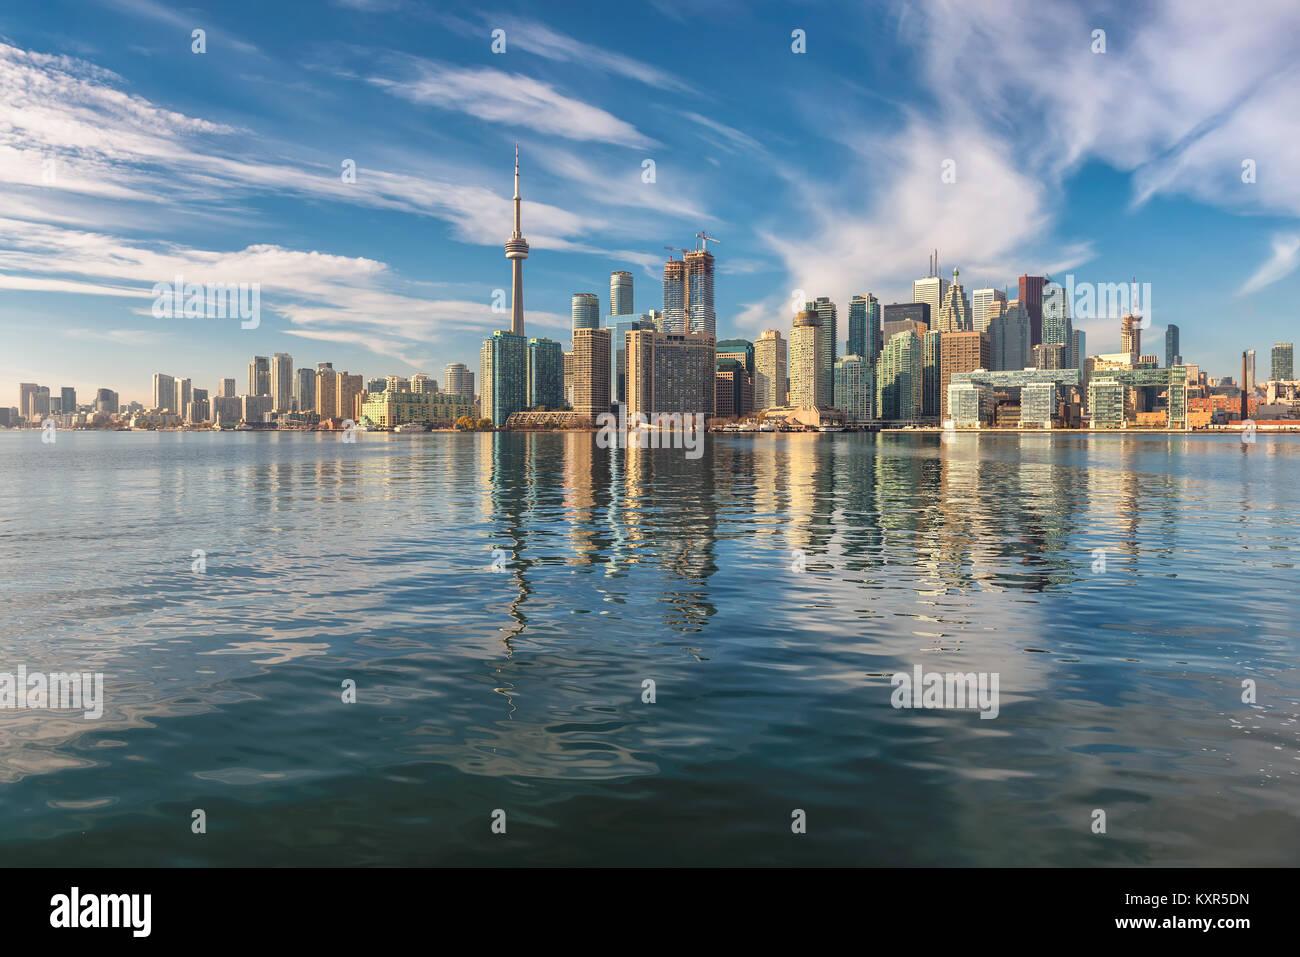 Toronto City Skyline im Sonnenuntergang, Ontario, Kanada. Stockbild